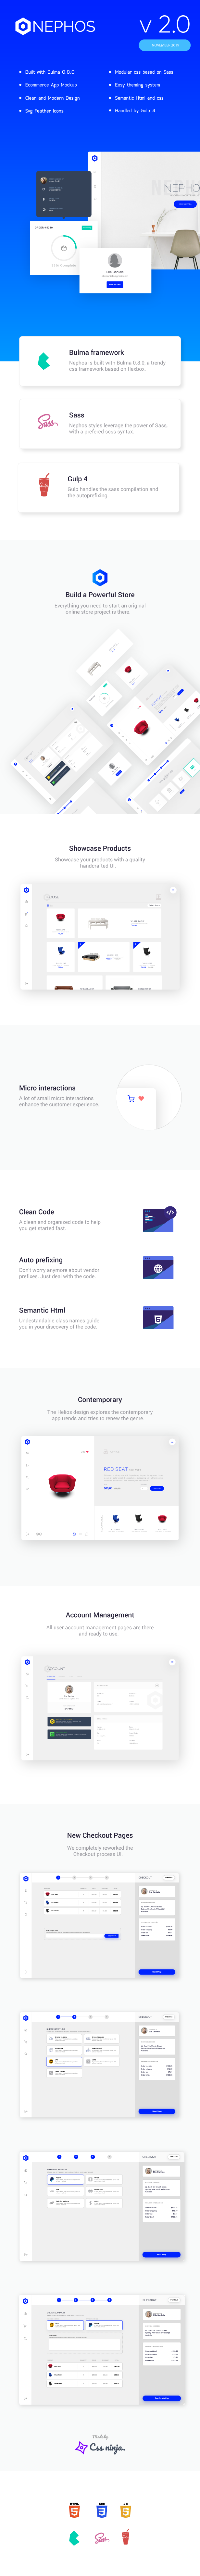 nephos infographics - Nephos - Modern Bulma Ecommerce Frontend